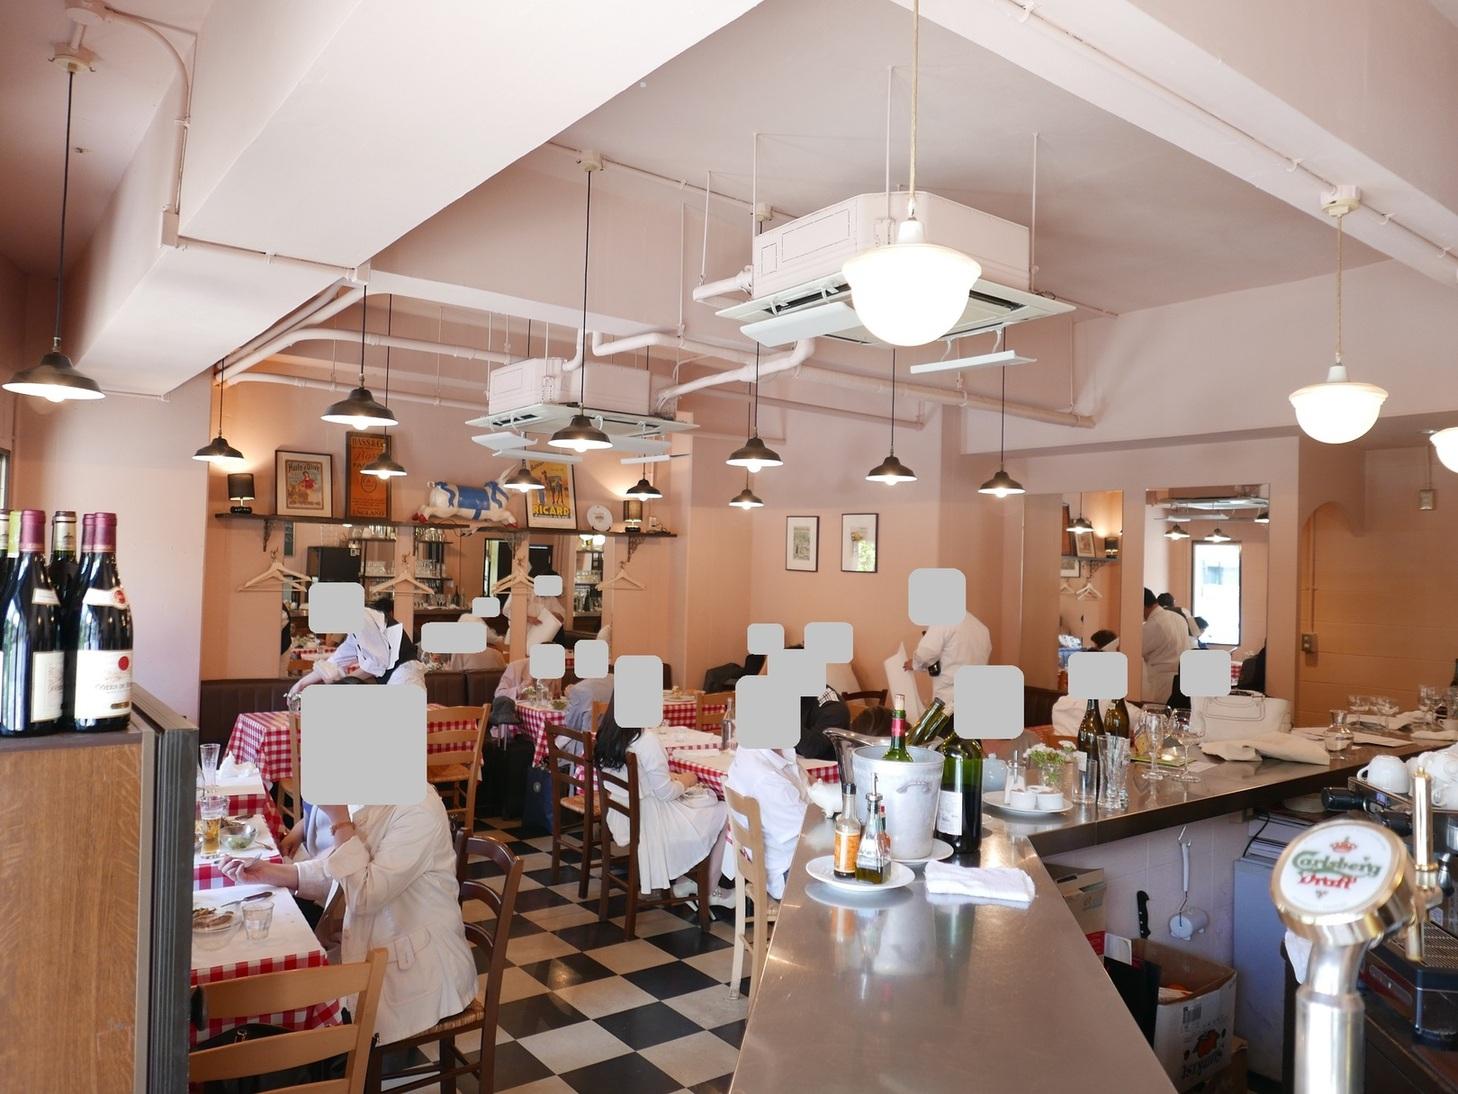 https://tabelog.ssl.k-img.com/restaurant/images/Rvw/37338/37338249.jpg